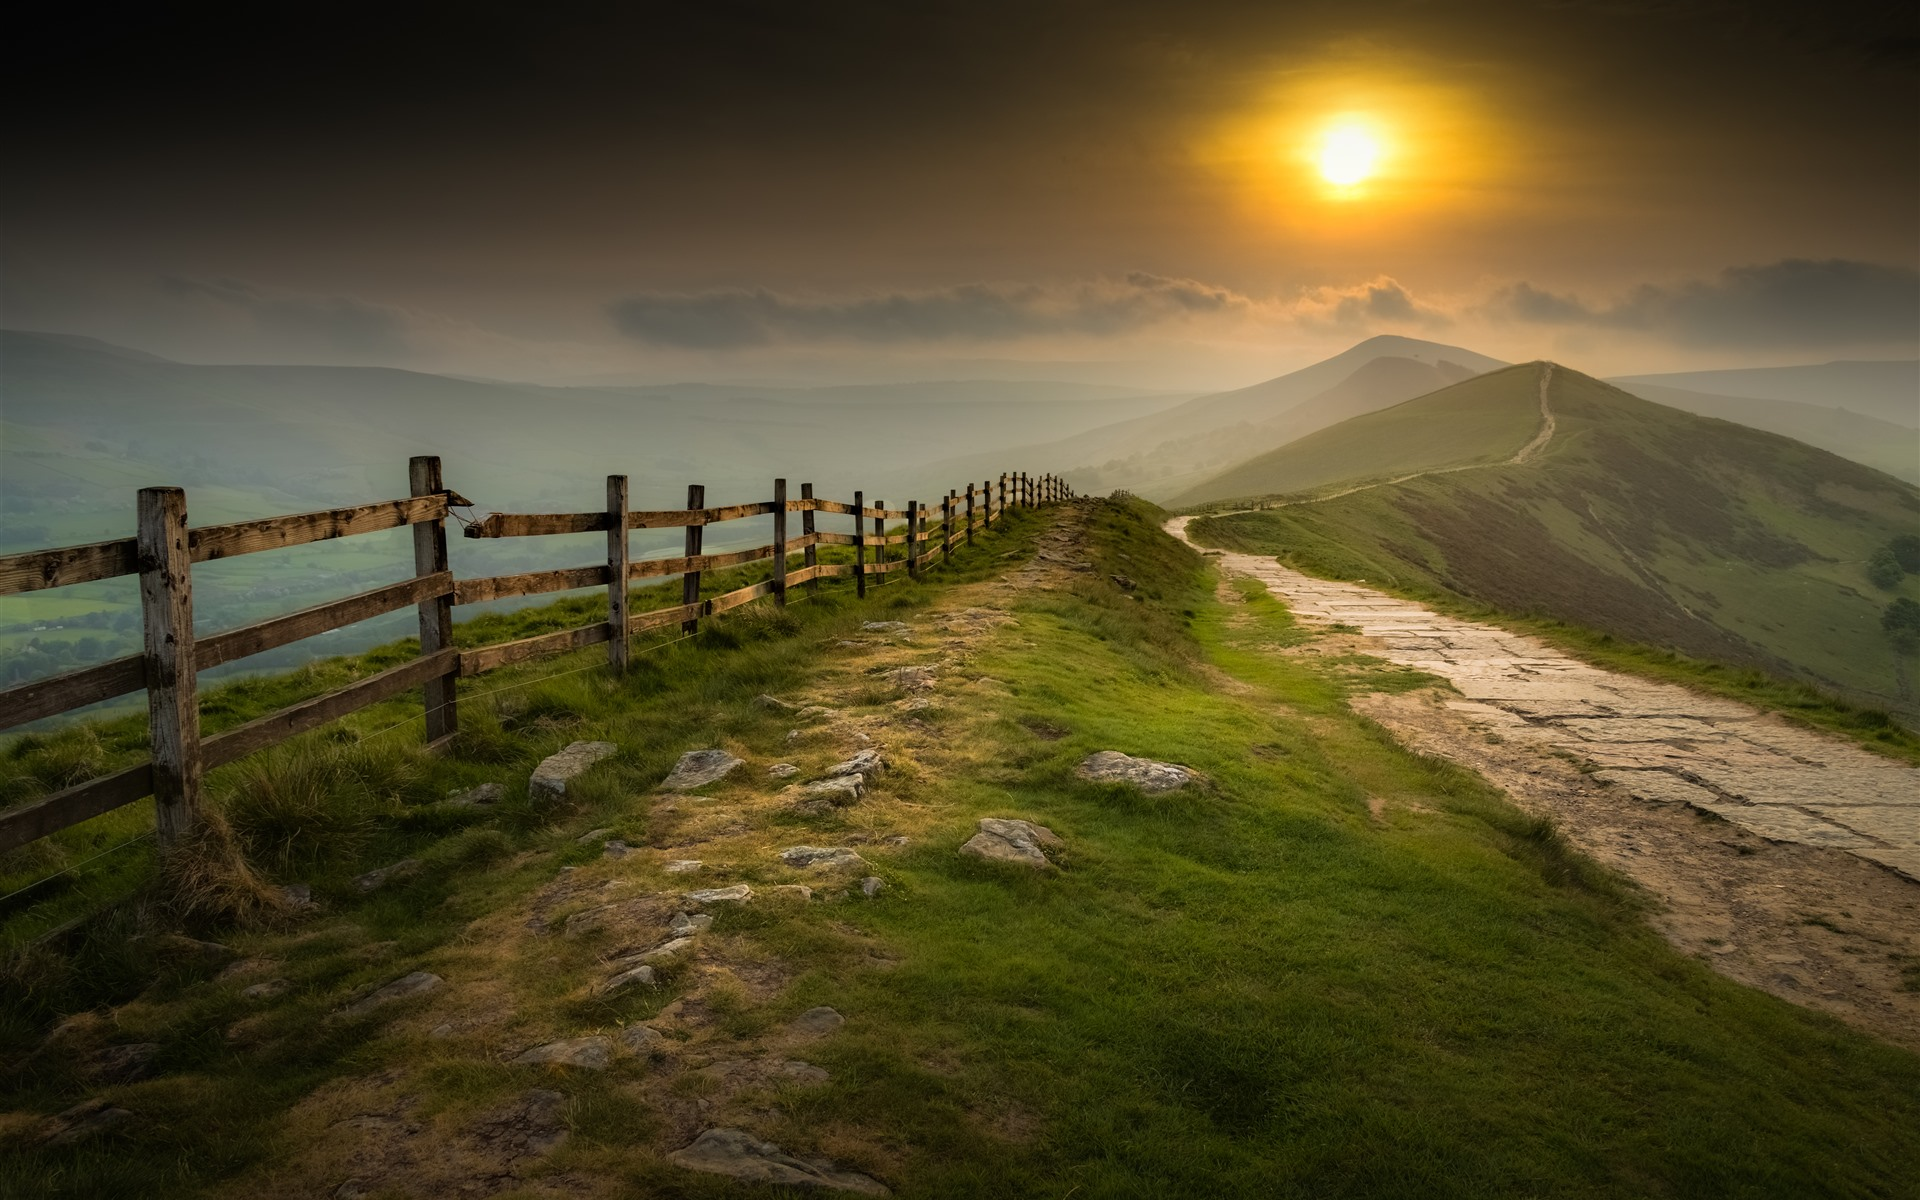 Wallpaper Mountains Fence Fog Sunrise 5120x2880 Uhd 5k Picture Image